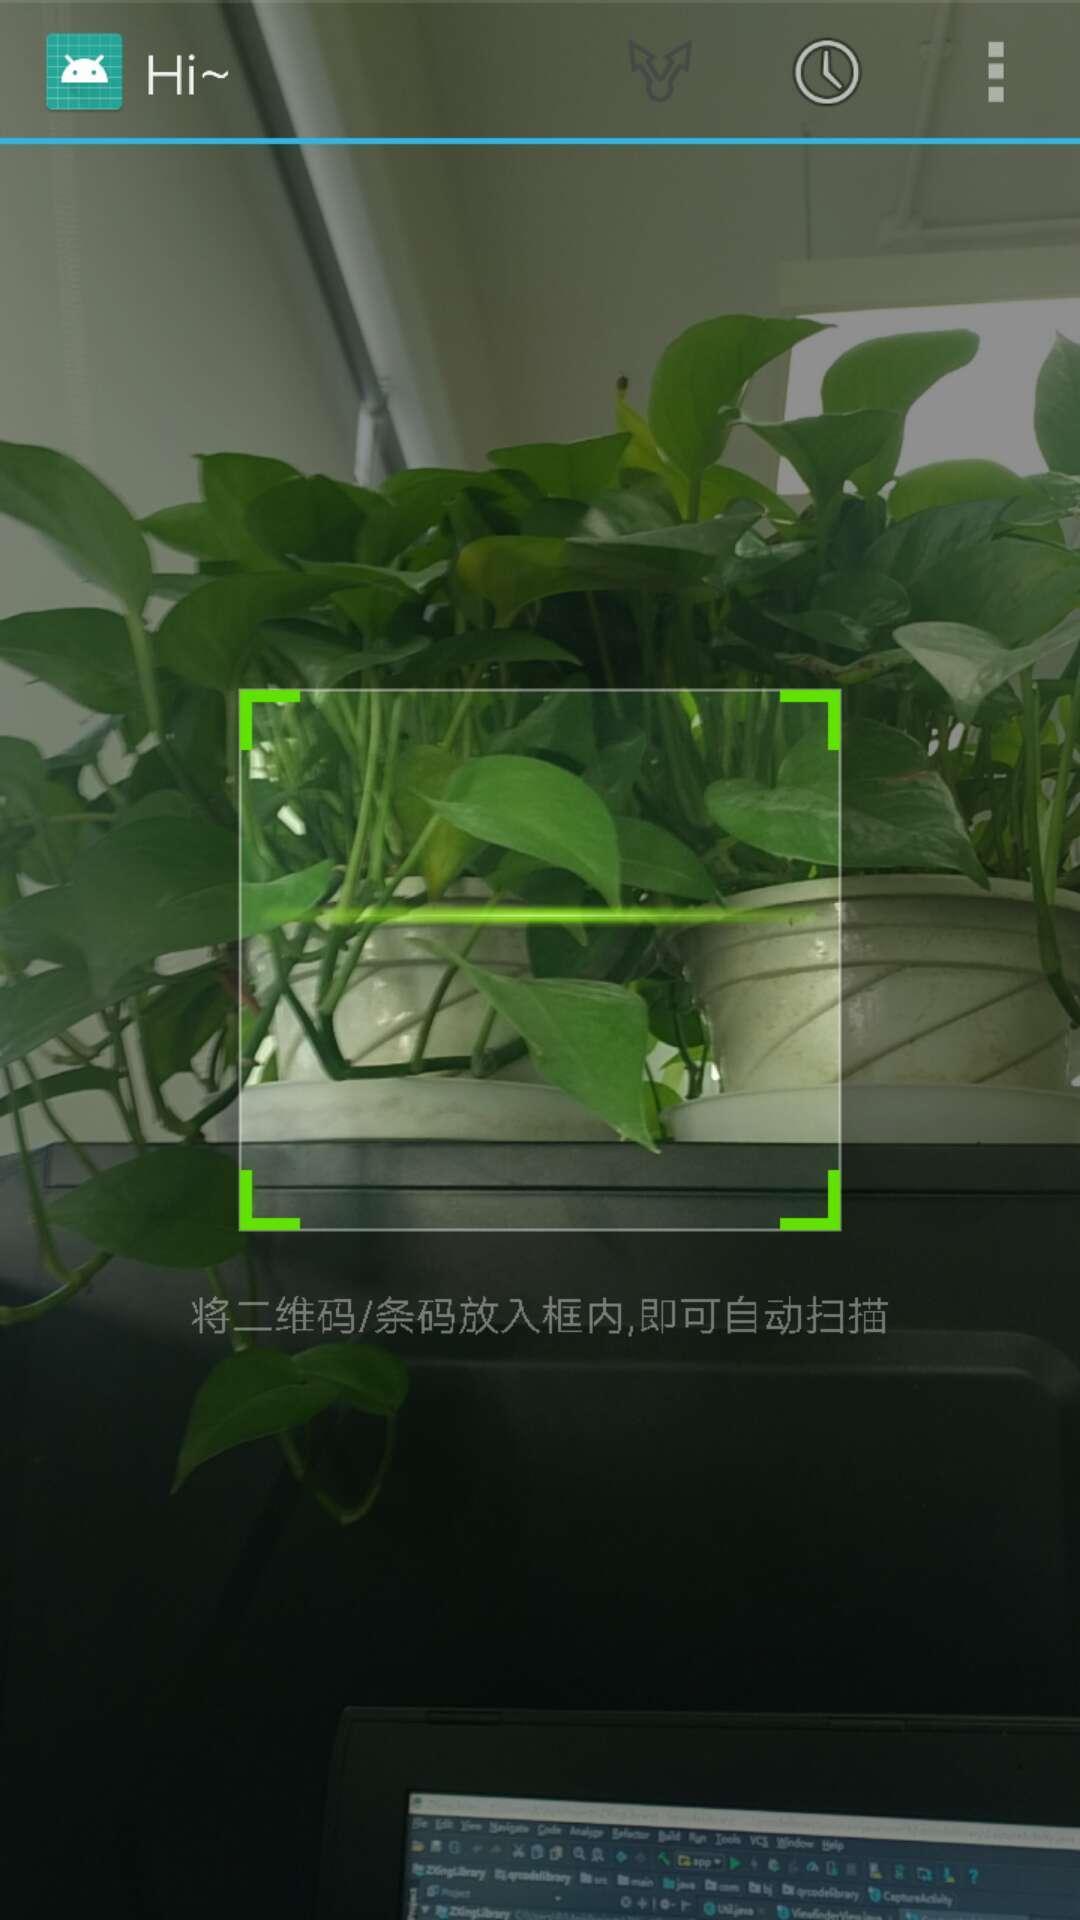 Android 二维码扫描(仿微信界面),根据Google zxing - 知乎